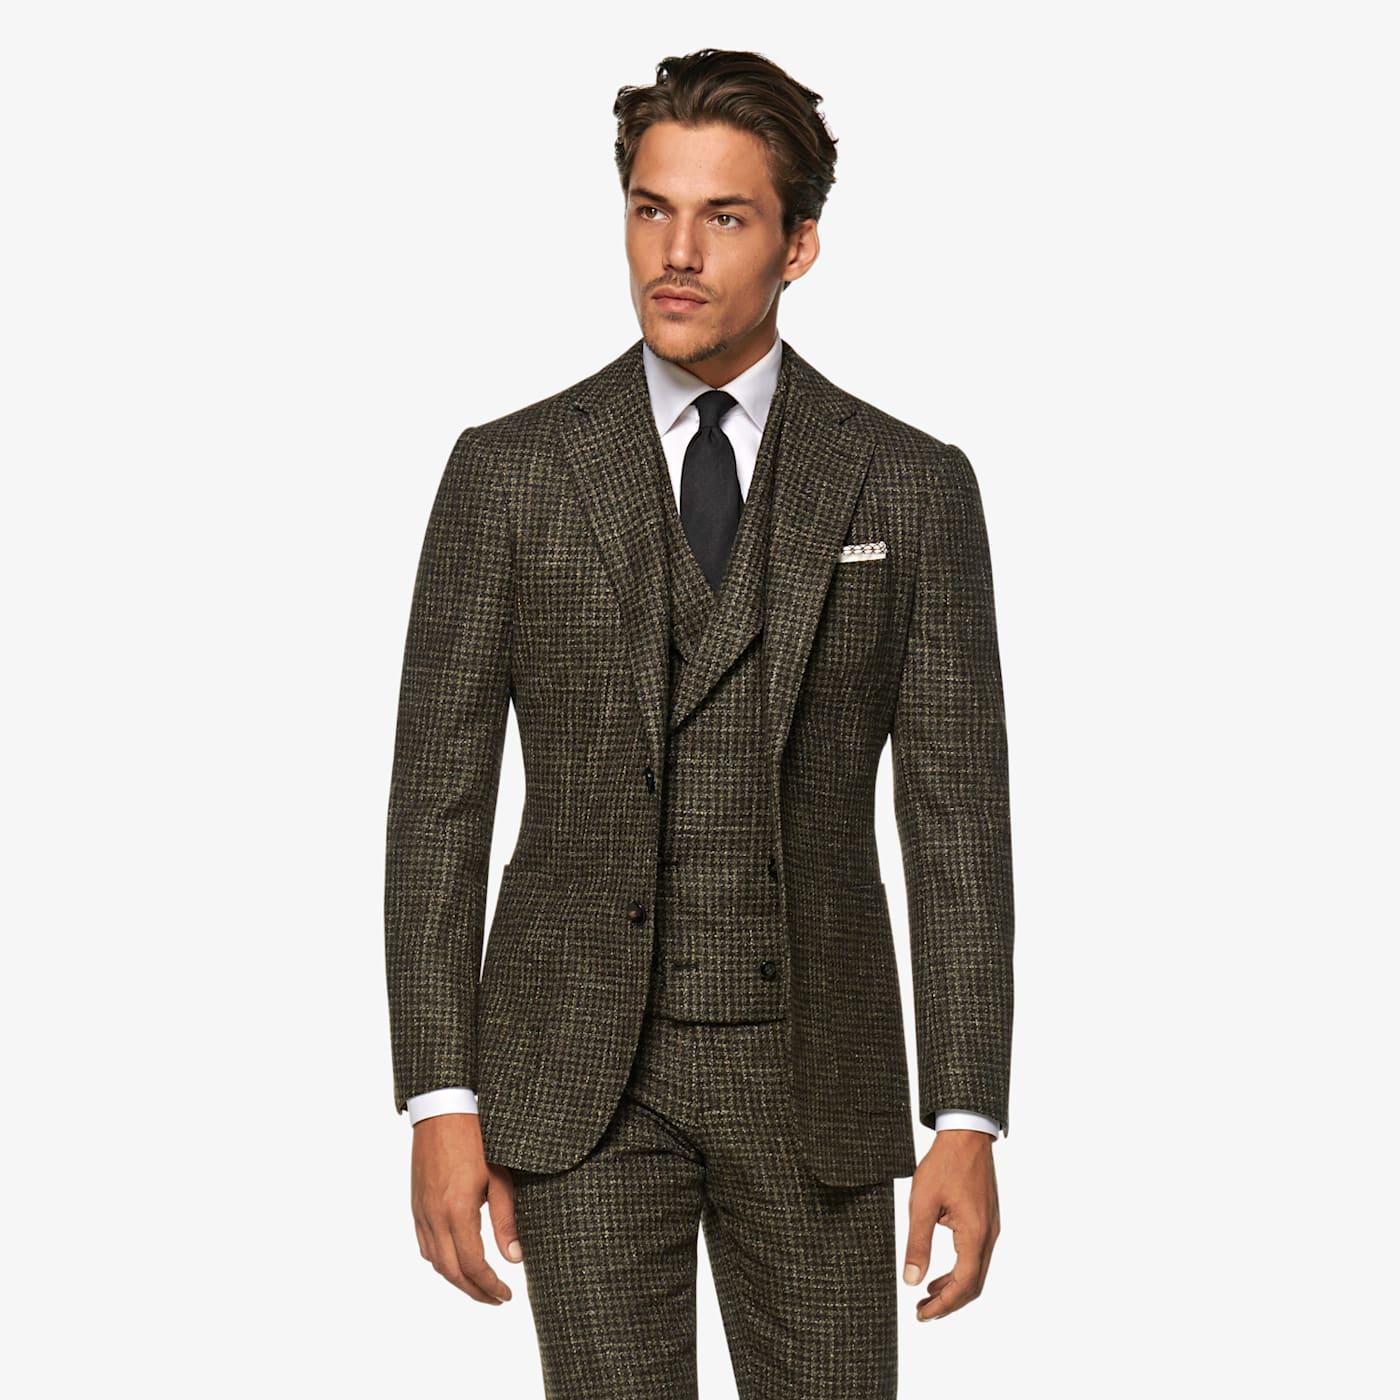 Men's Vintage Style Suits, Classic Suits Mid Green Houndstooth Havana Suit $899.00 AT vintagedancer.com